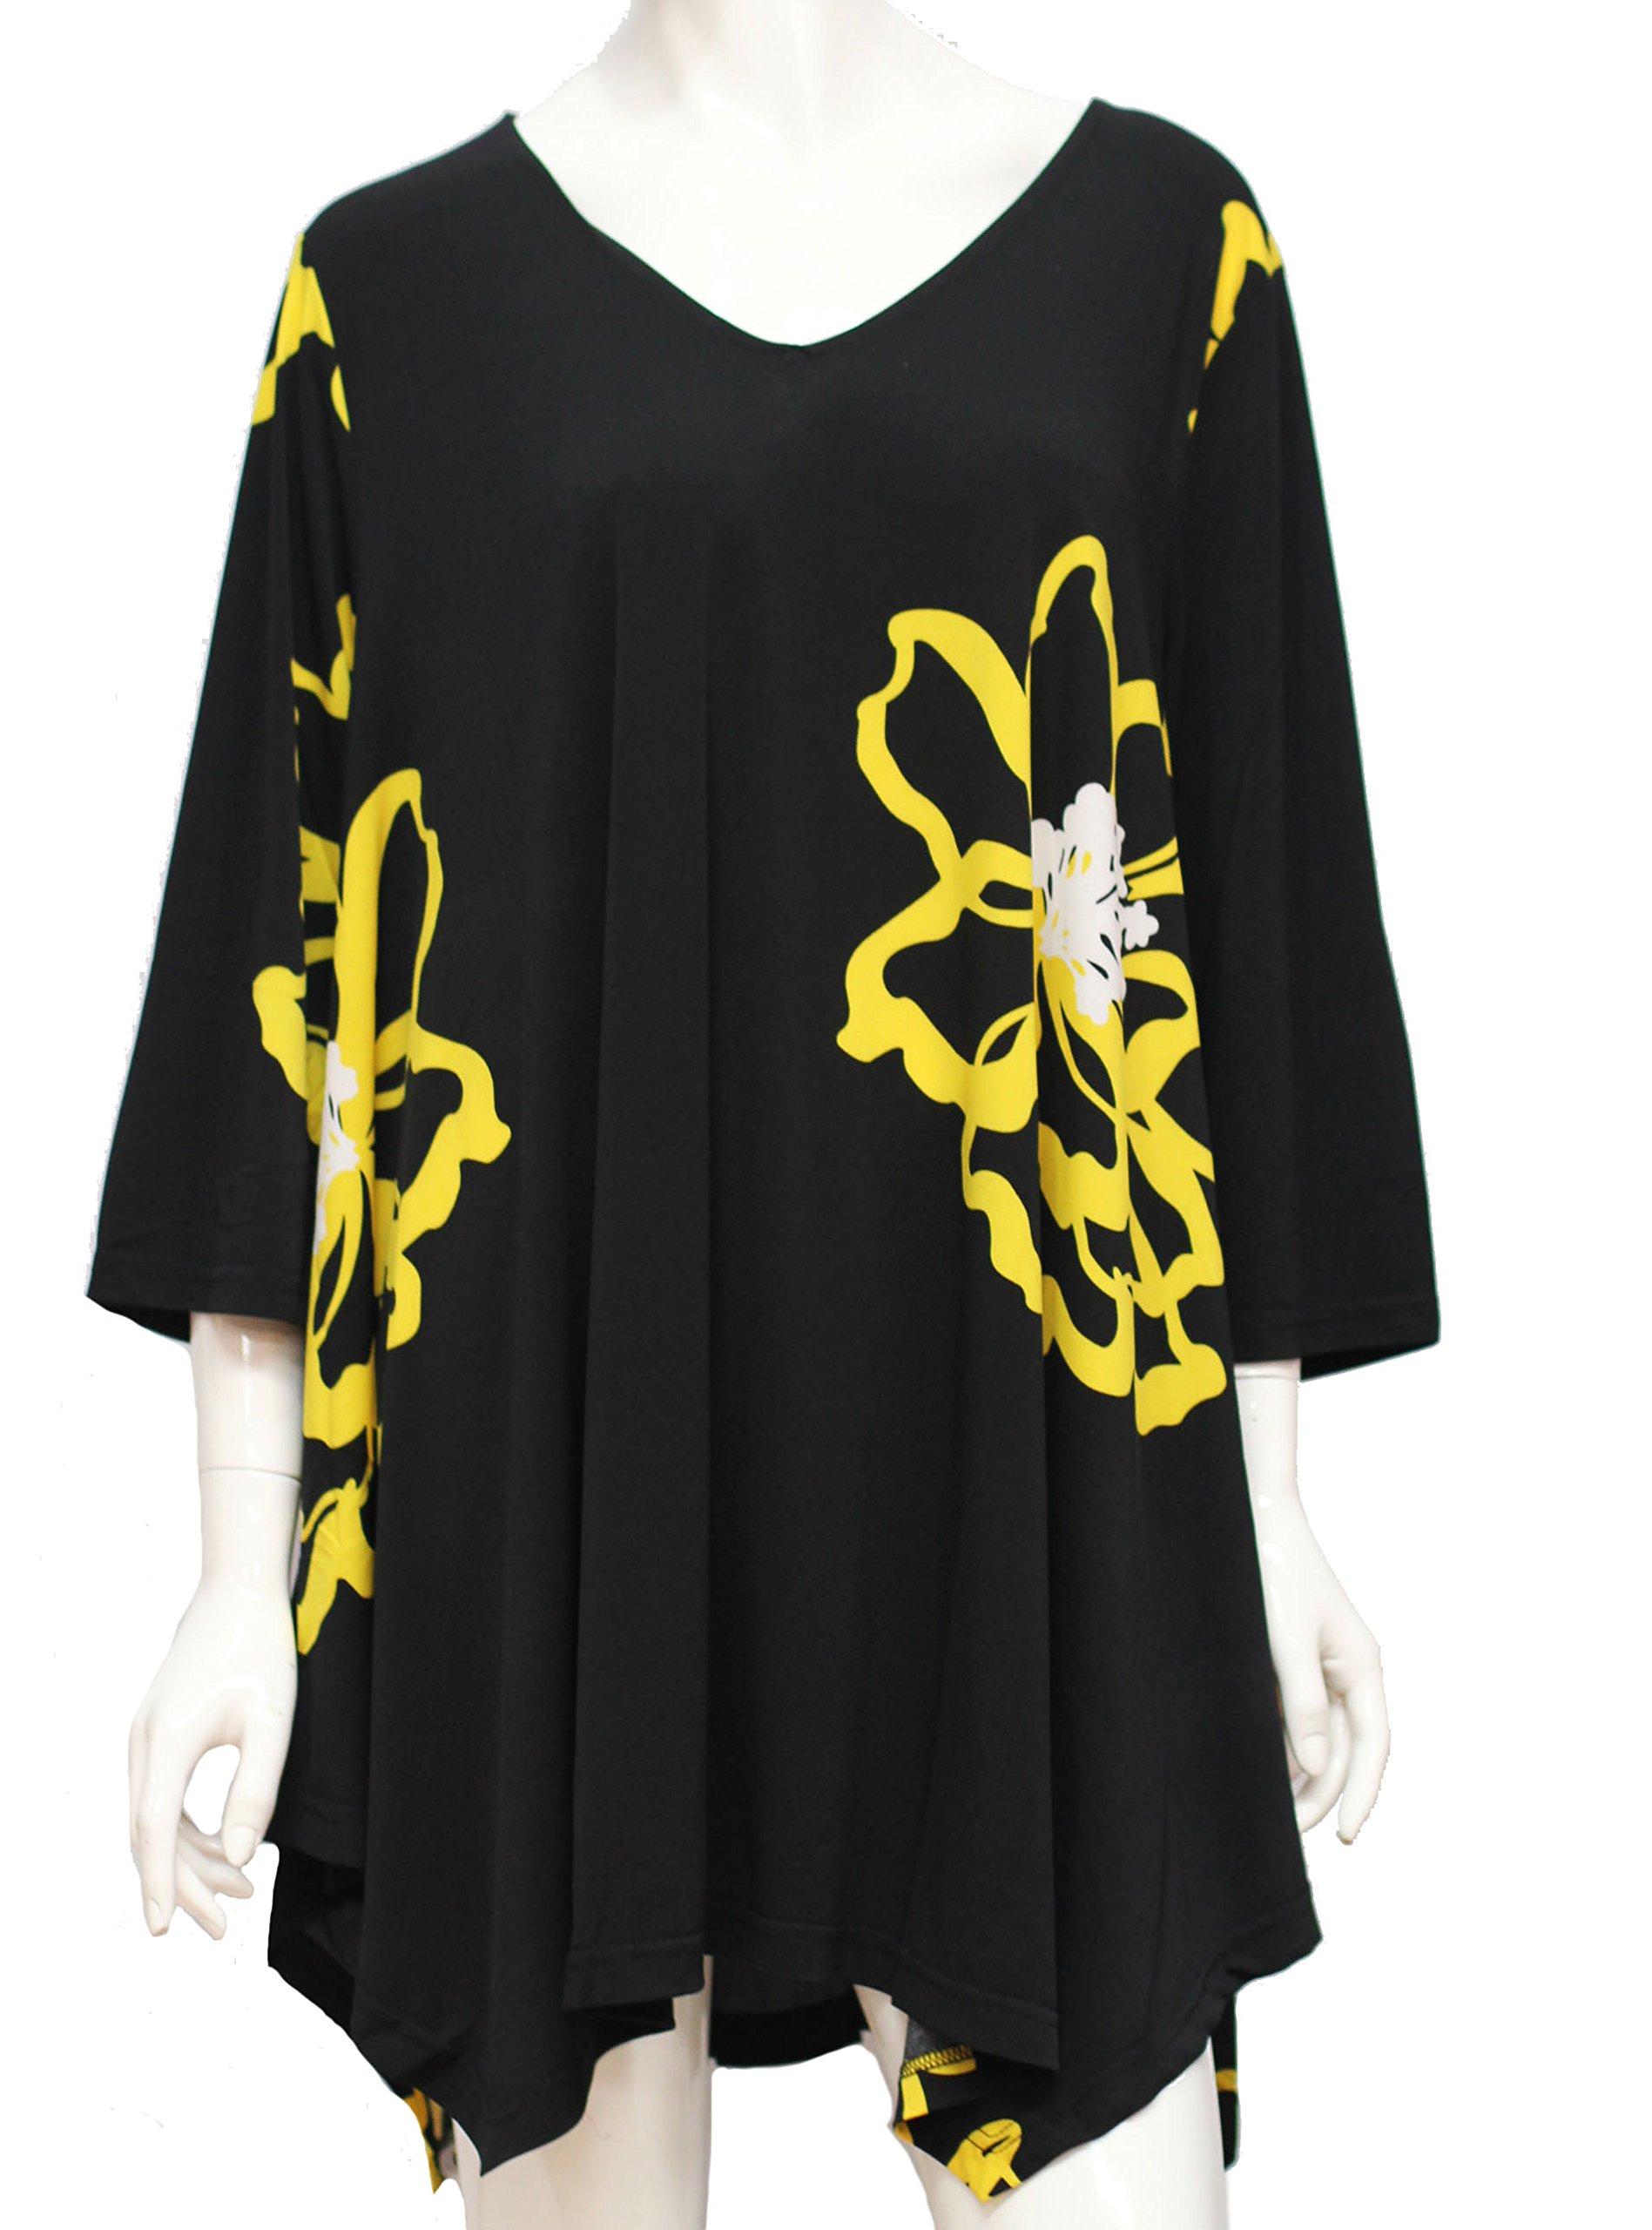 Alisha D Travel Wear Best Selling Plus Sized Tunic (Print 2, 2)